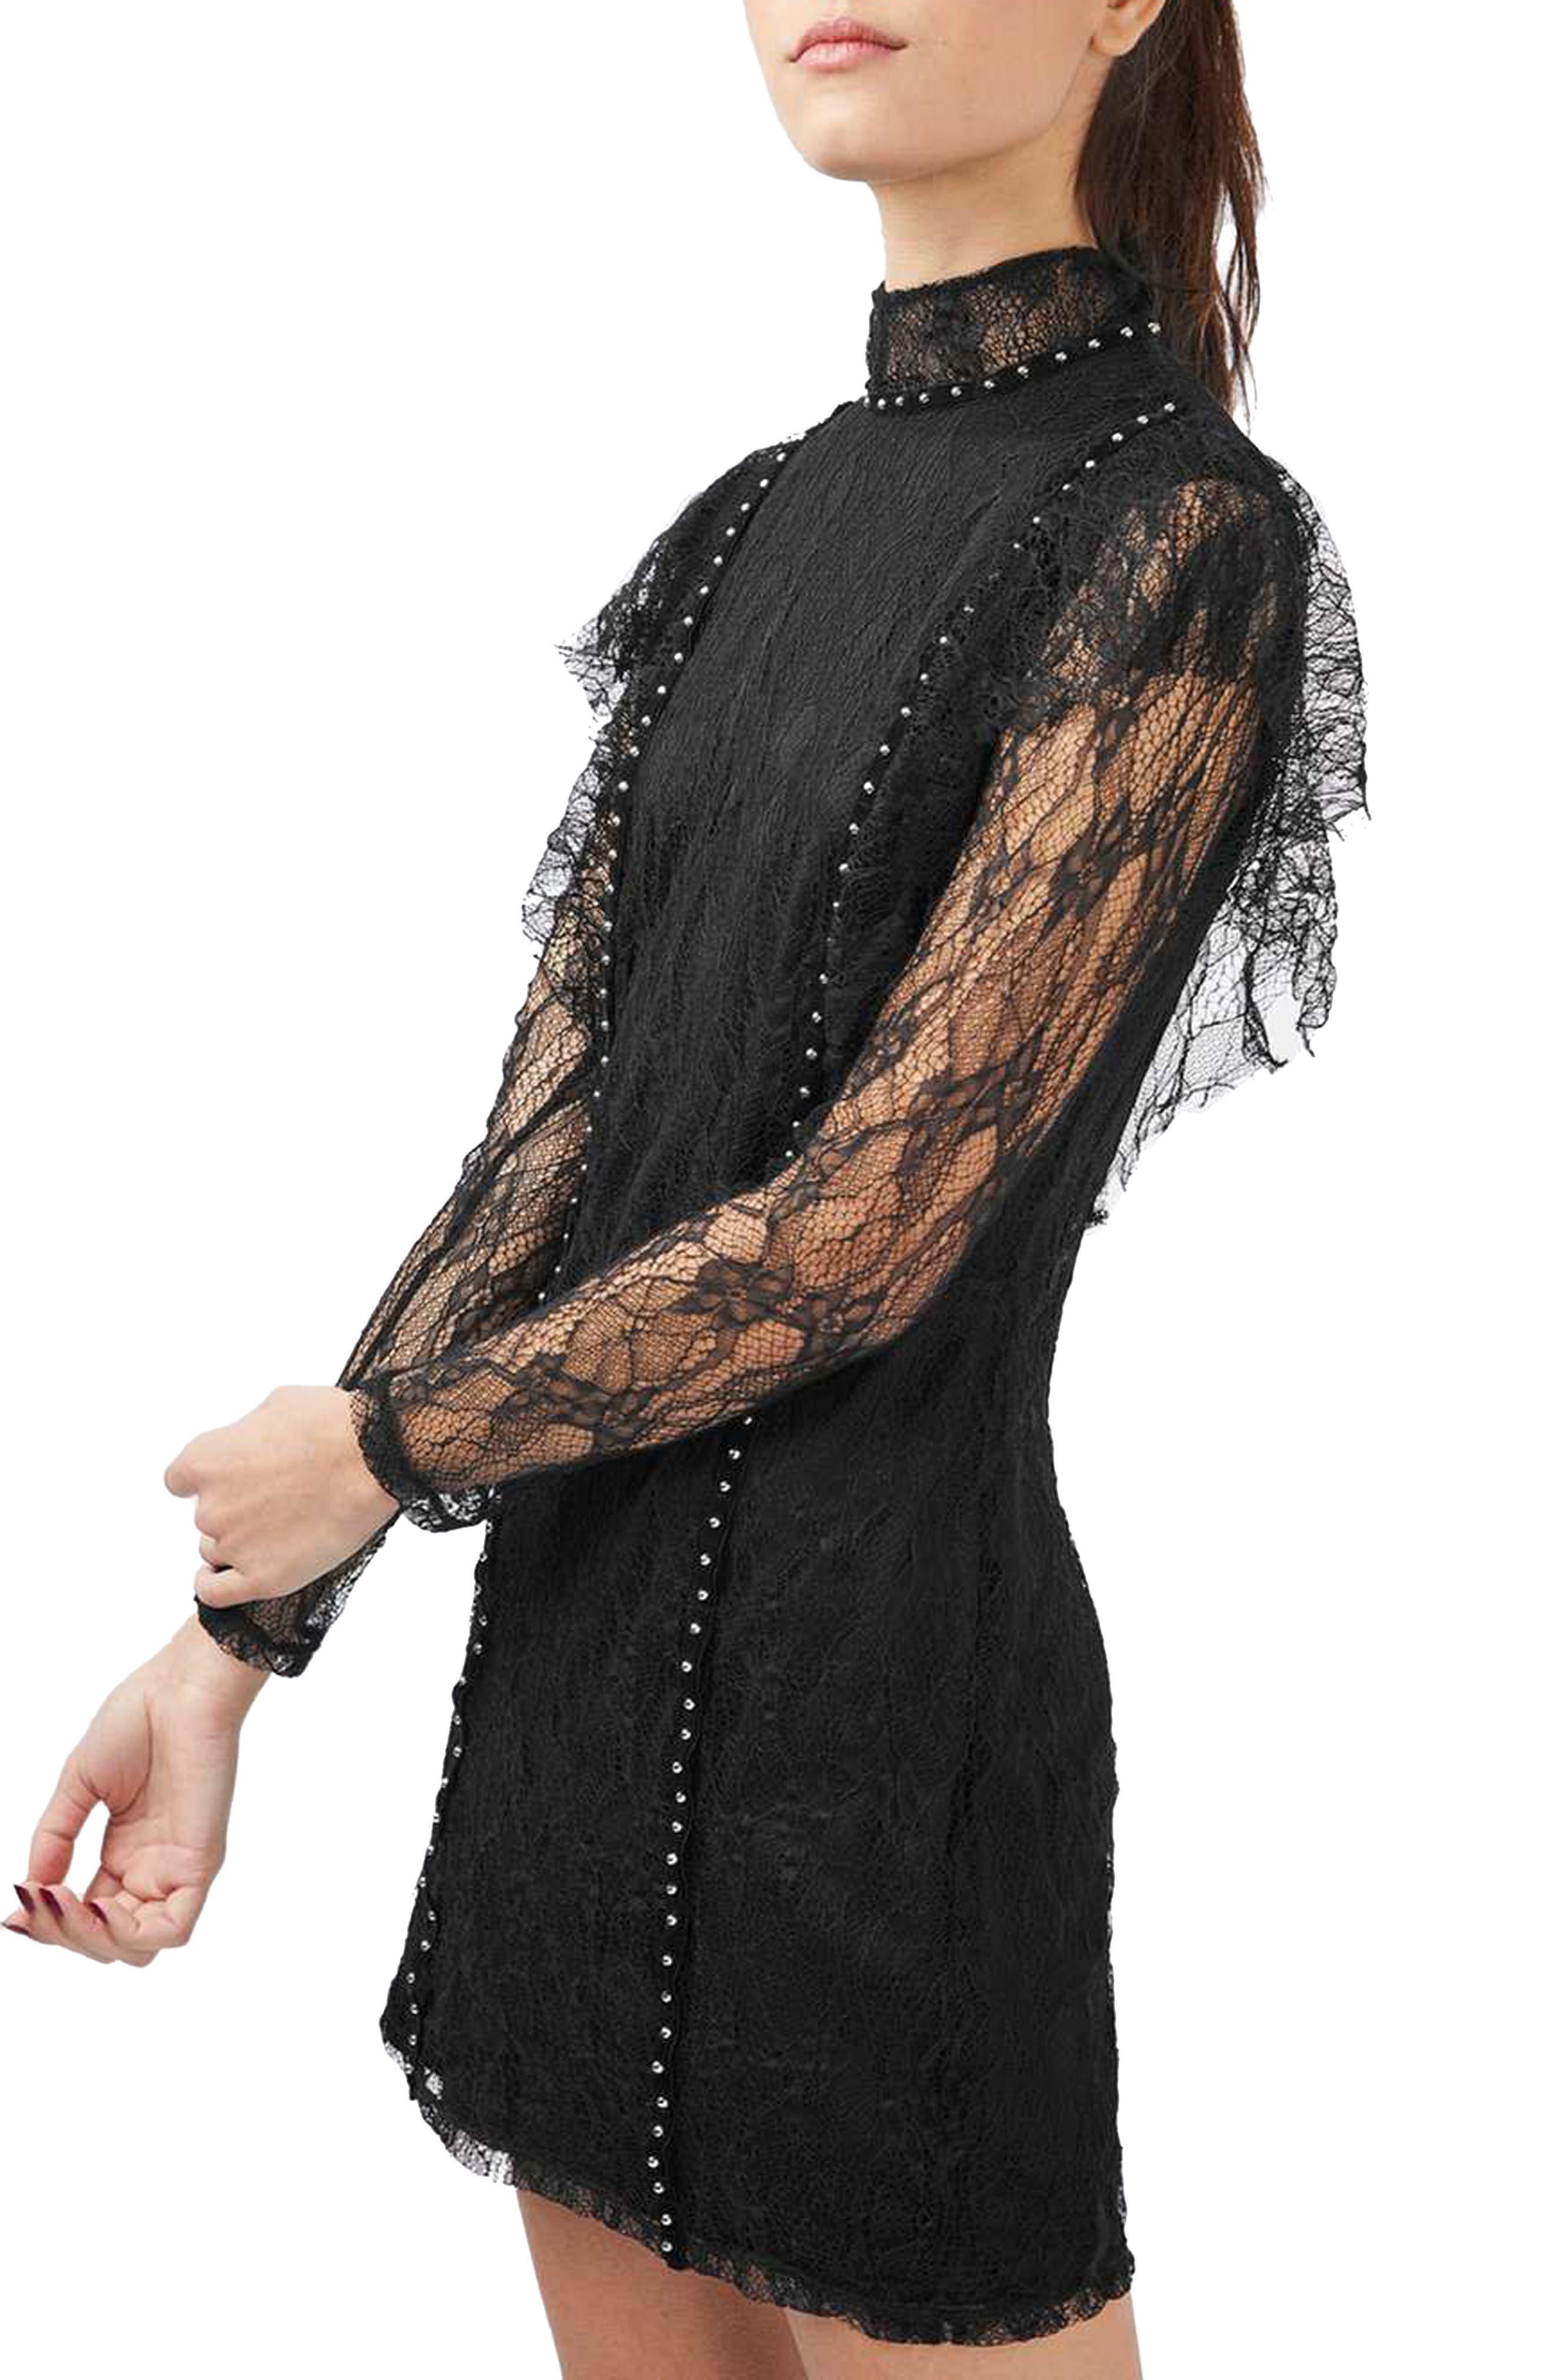 Alternate Image 1 Selected - Topshop Stud Ruffle Lace Dress